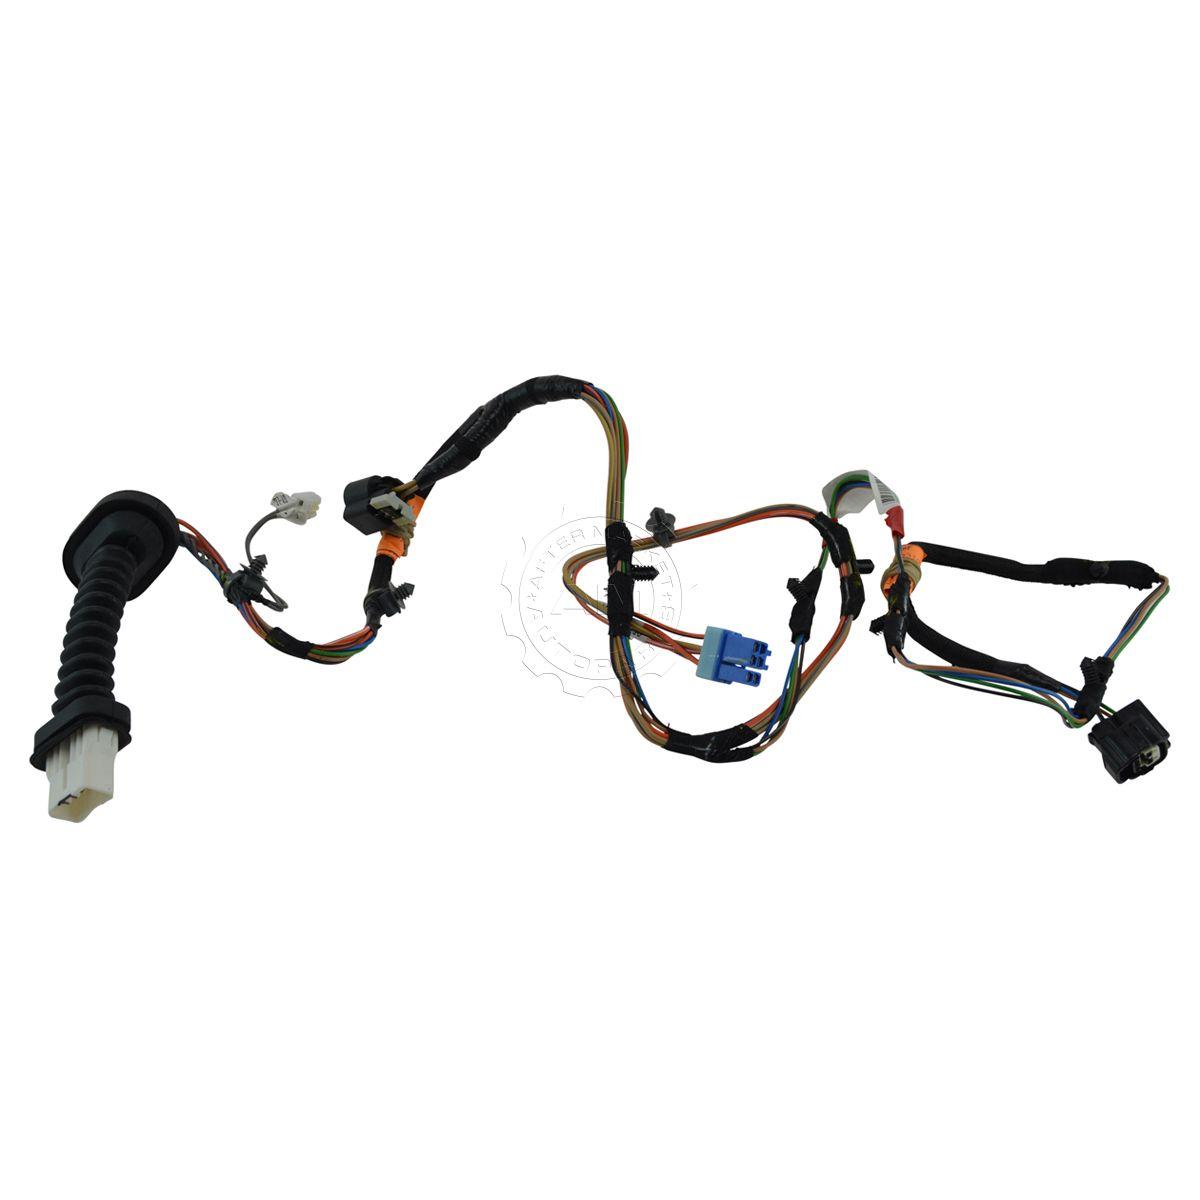 oem 56051393ac rear door wiring harness for 06 09 dodge ram mega cab rh ebay com dodge stratus door wiring harness dodge stratus door wiring harness